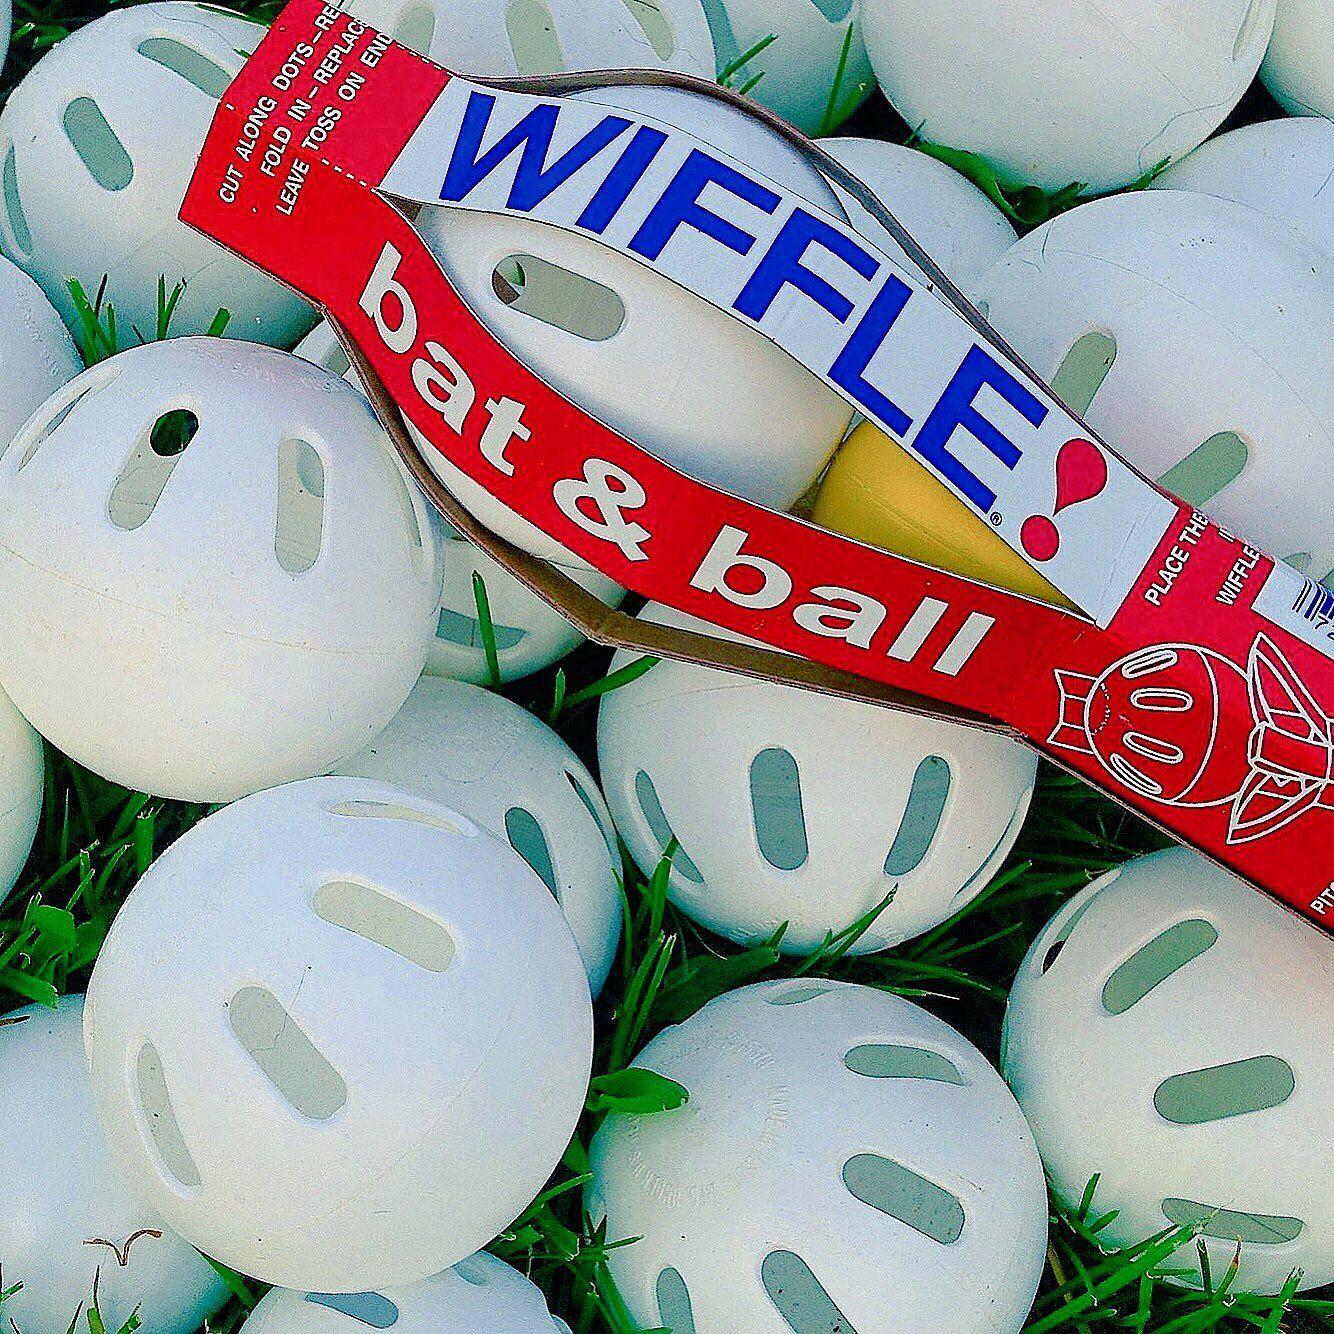 Pin By Alan Garcia On Wiffle Ball In 2020